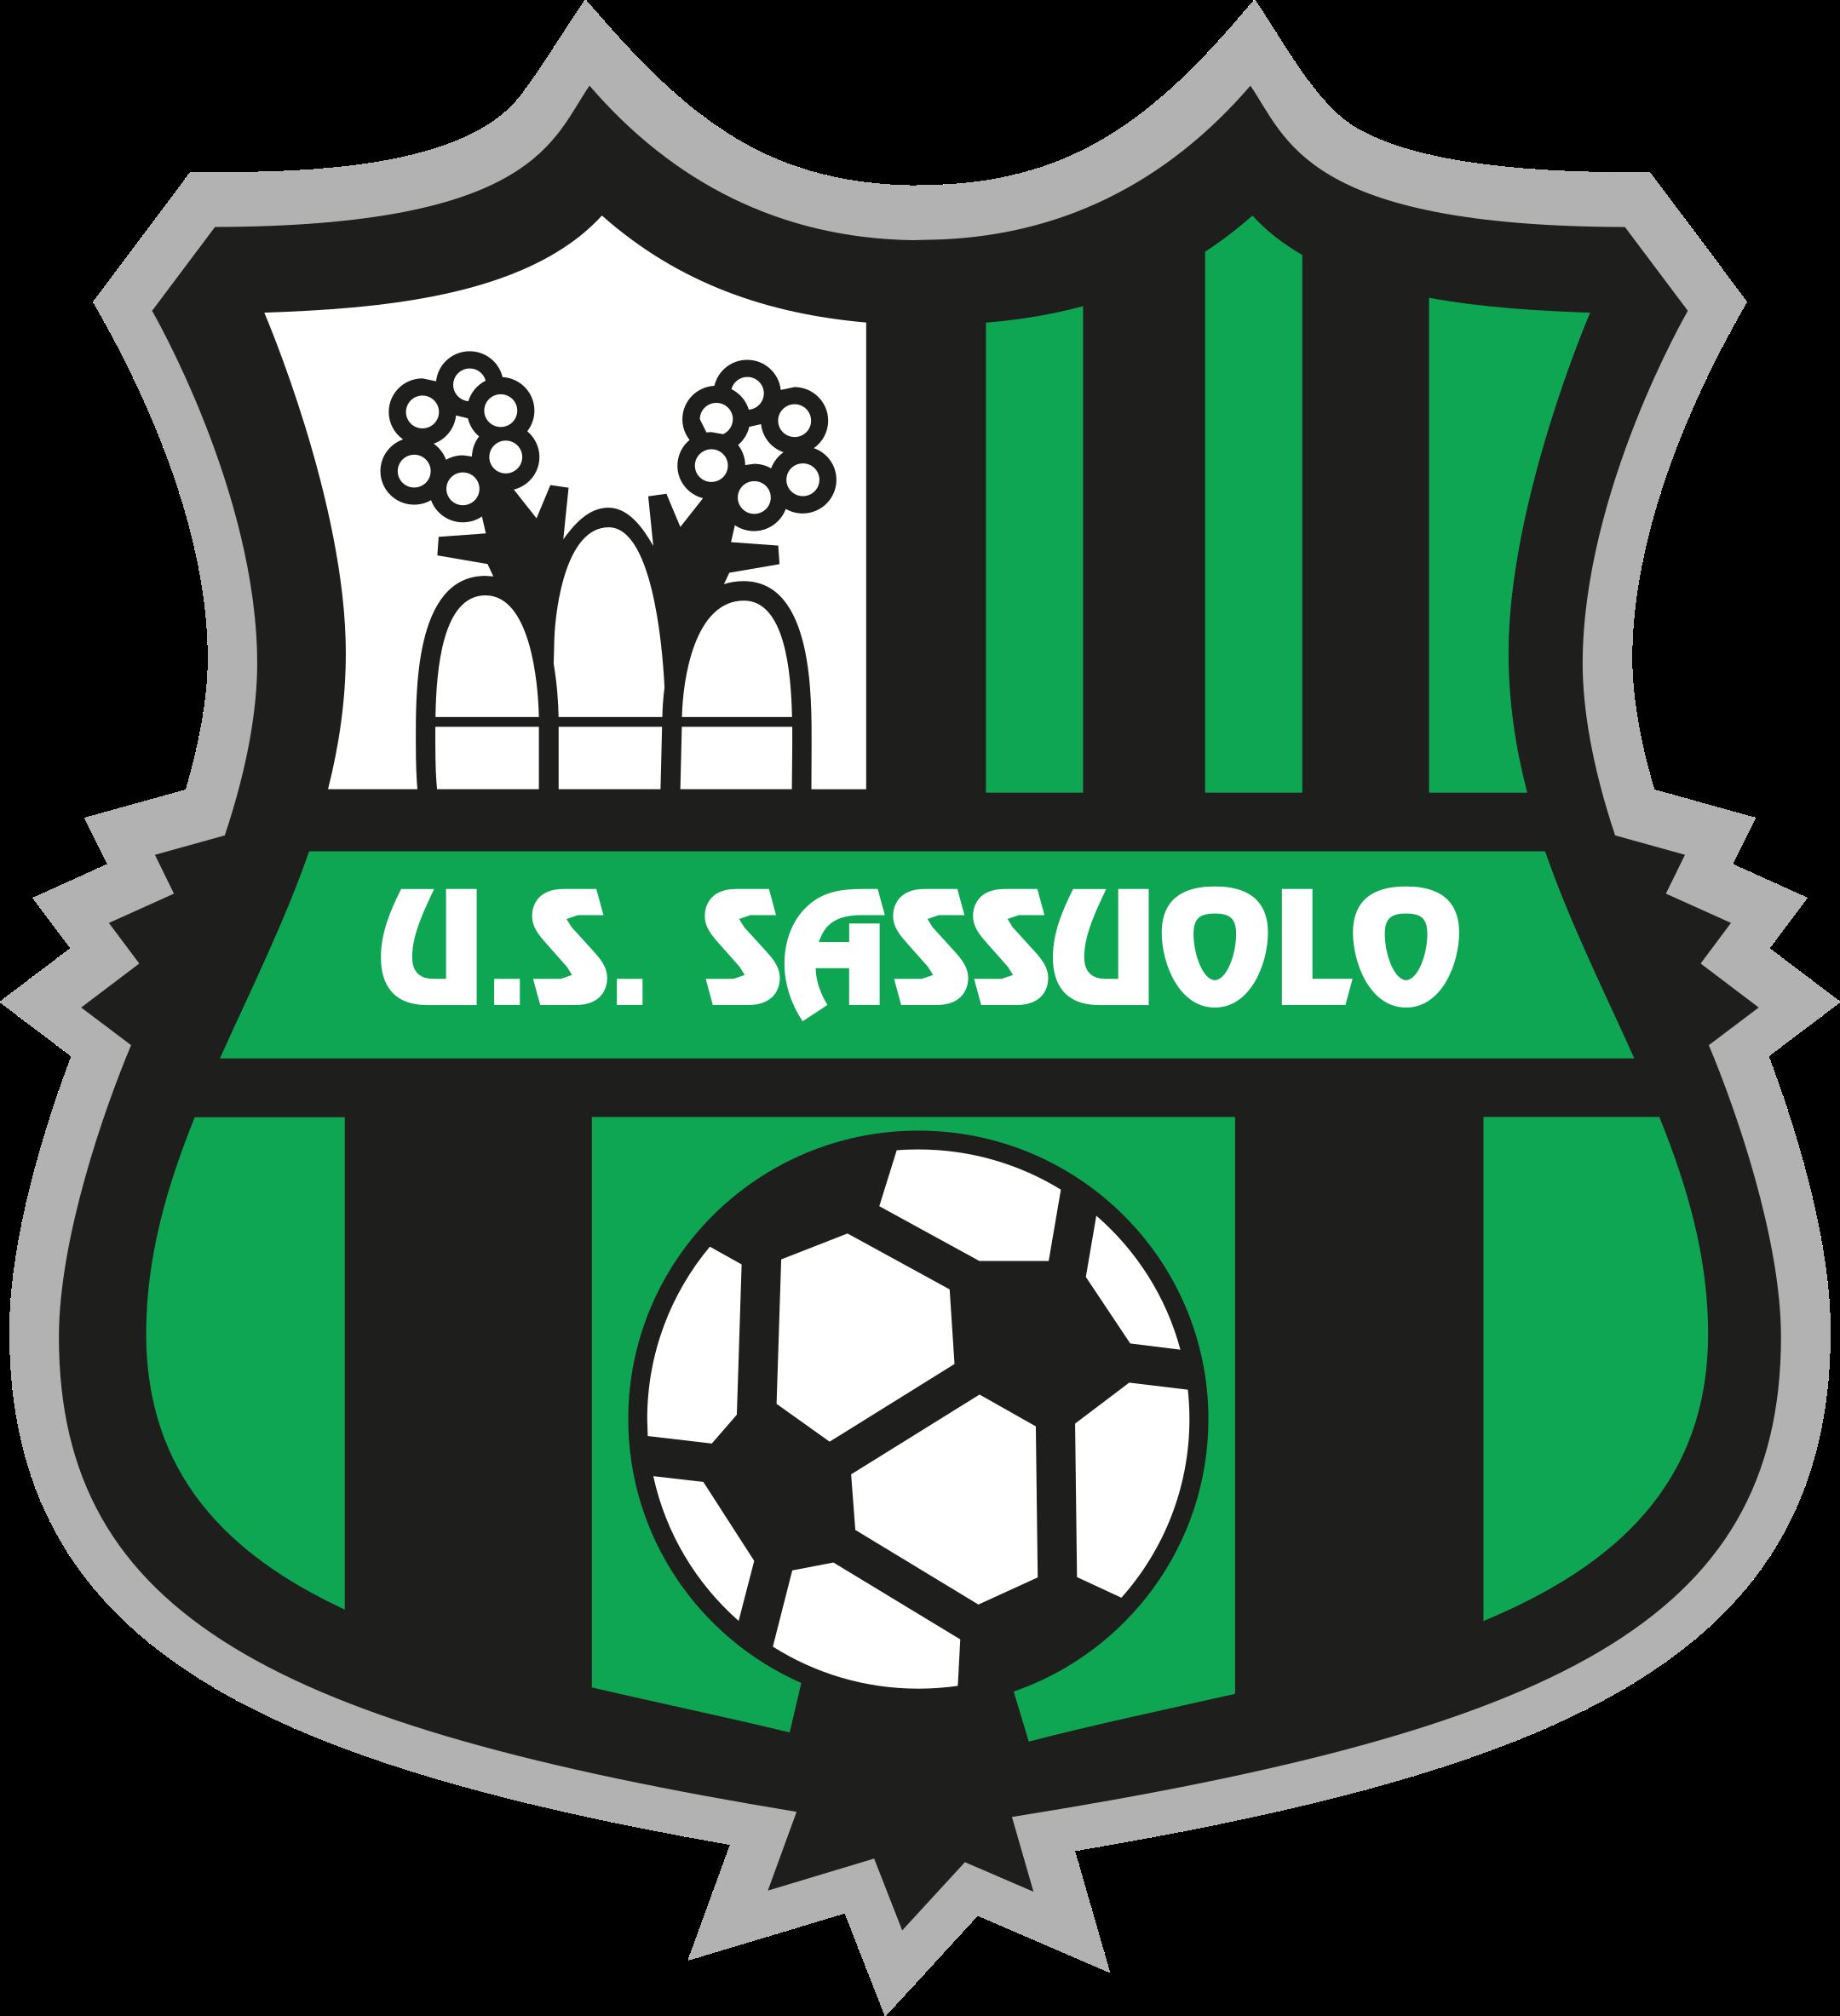 sassuolo calcio logo 1 - Sassuolo Calcio Logo